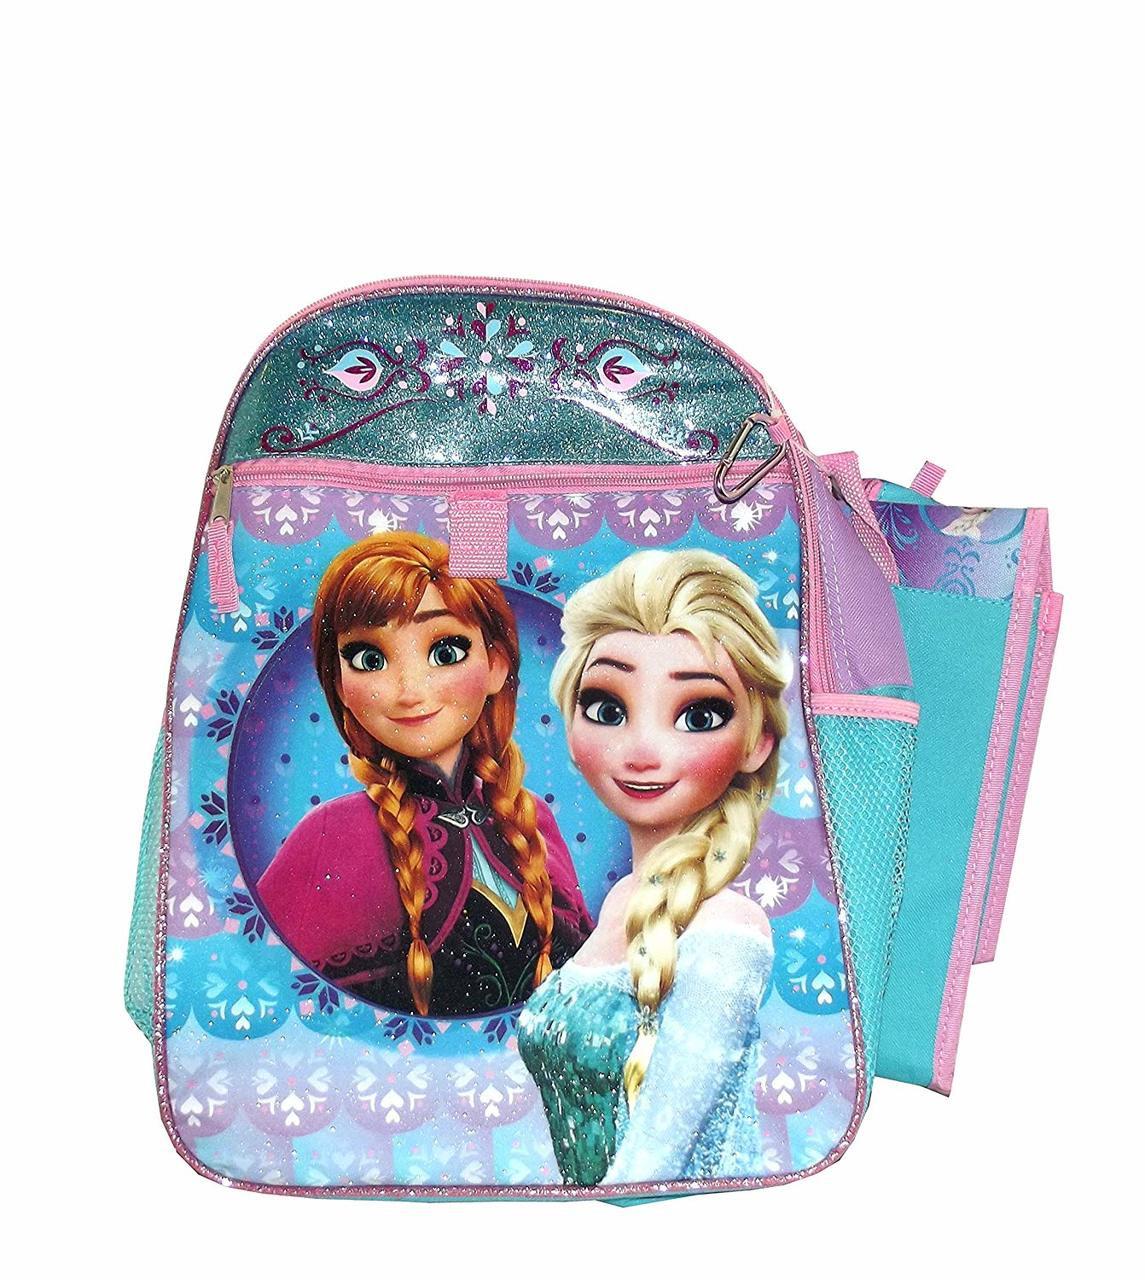 Frozen Elsa 5-Piece 16 Backpack Set with Lunch Bag Disney